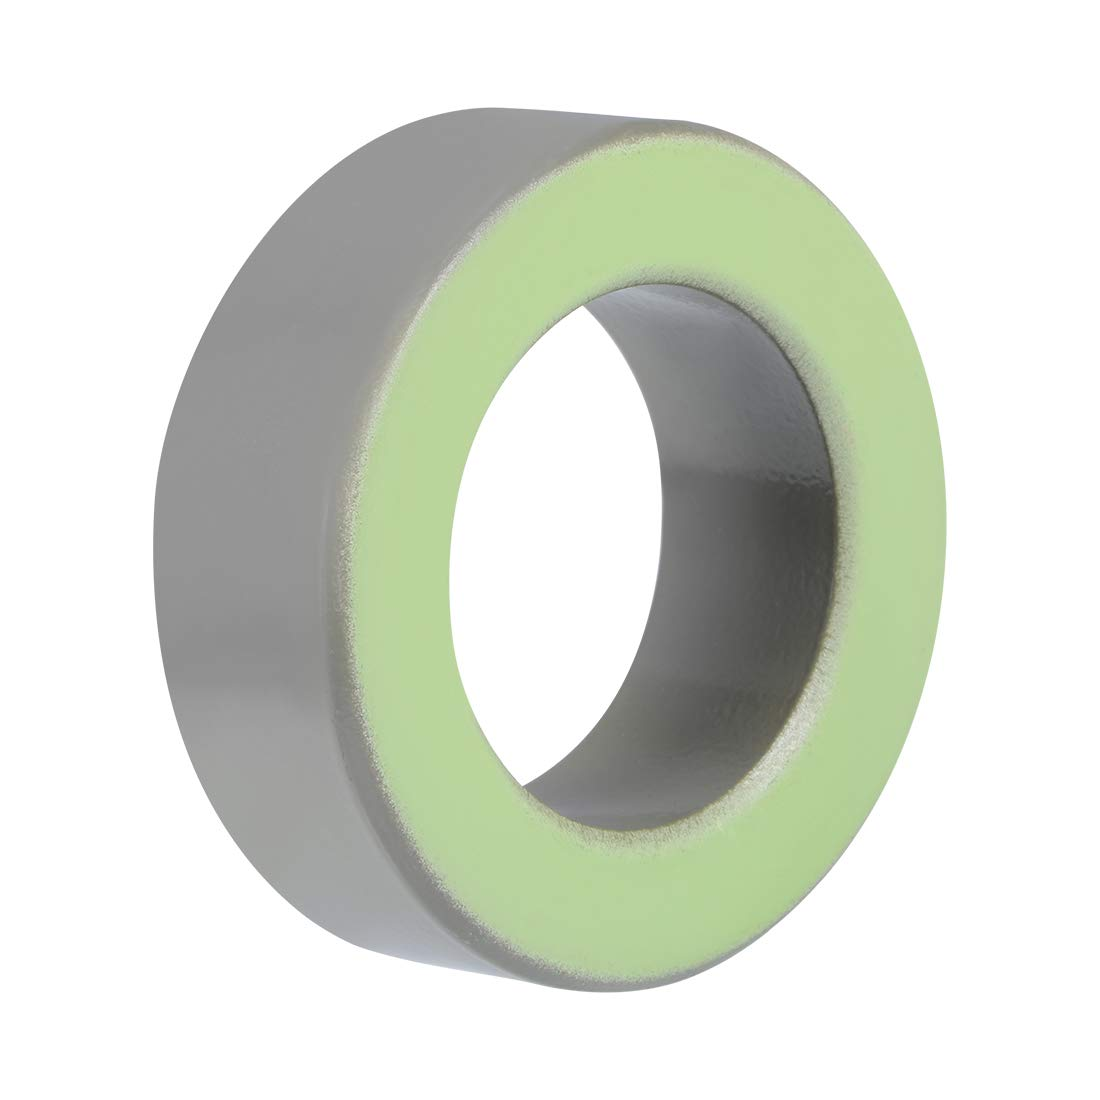 uxcell 48.5 x 77.8 x 26mm Ferrite Ring Iron Powder Toroid Cores Gray Light Green